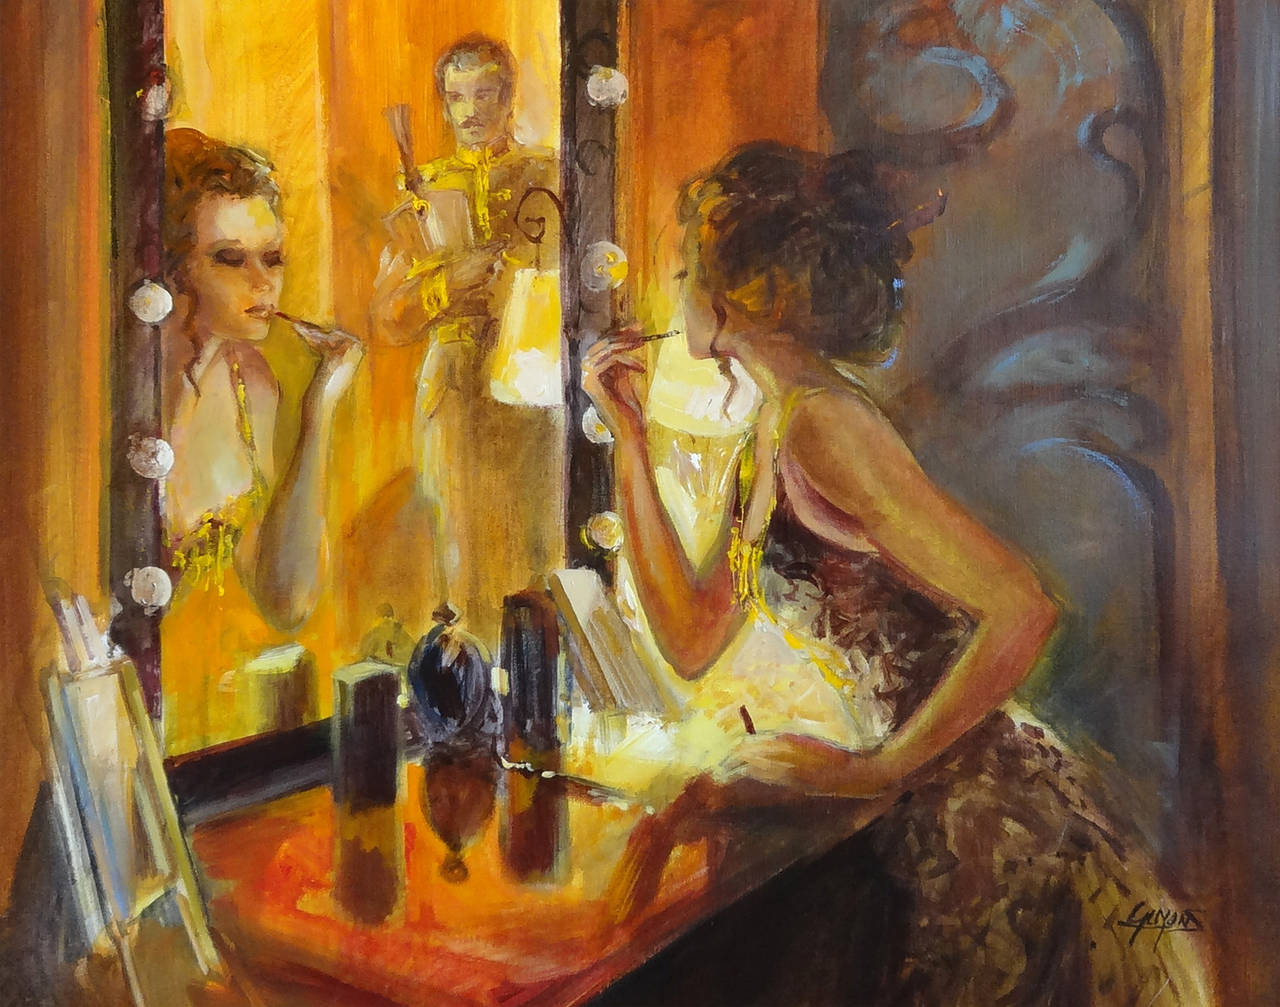 Michel guyon femme au miroir at 1stdibs for Miroir au alouette